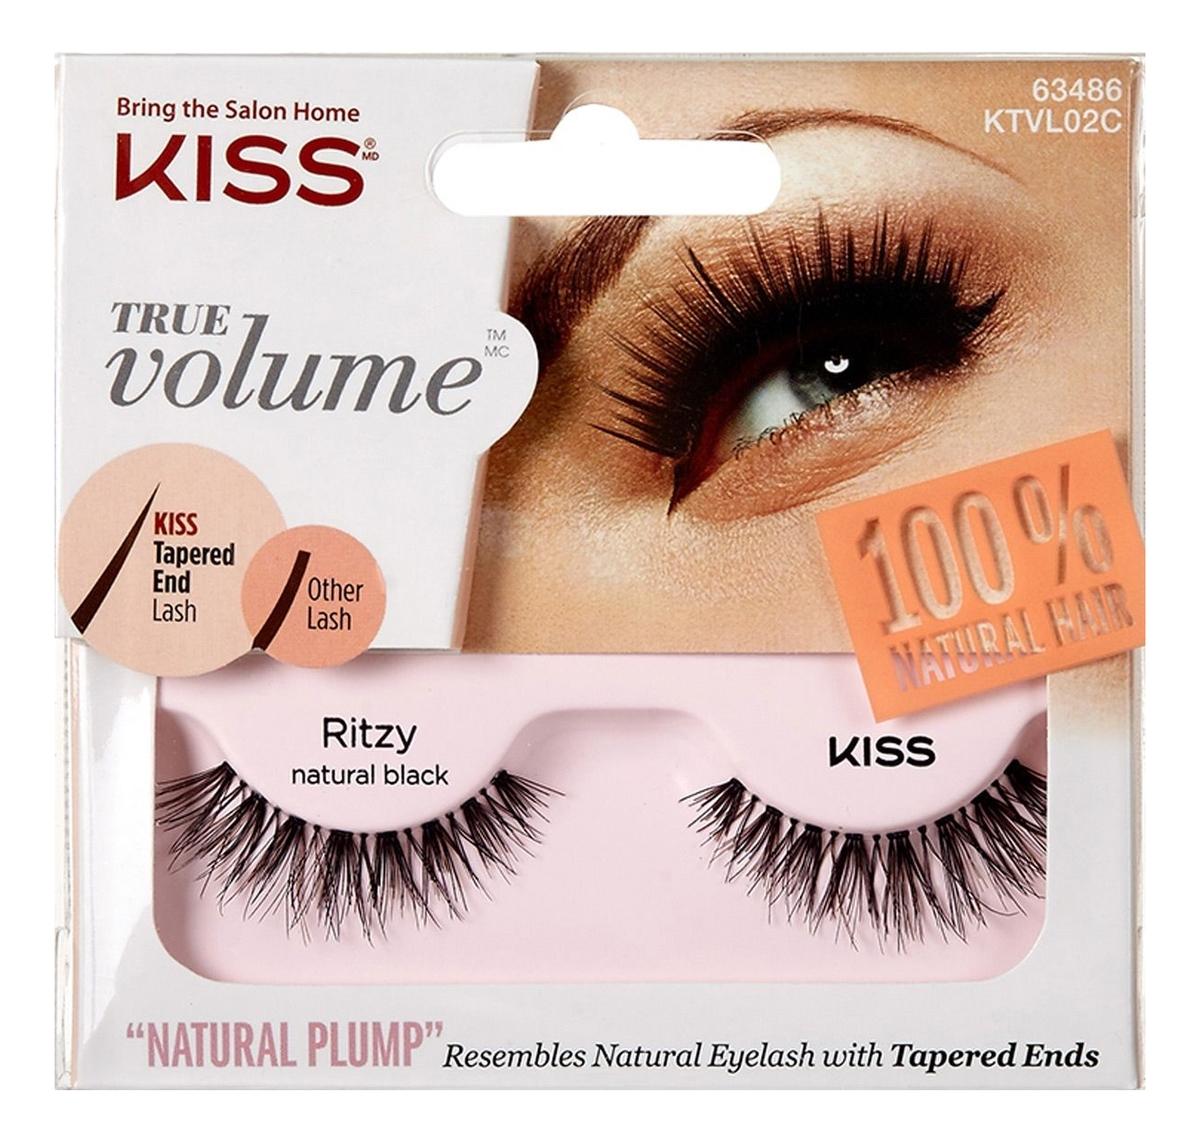 Накладные ресницы True Volume: Lash Ritzy накладные ресницы kiss single lashes ritzy page 1